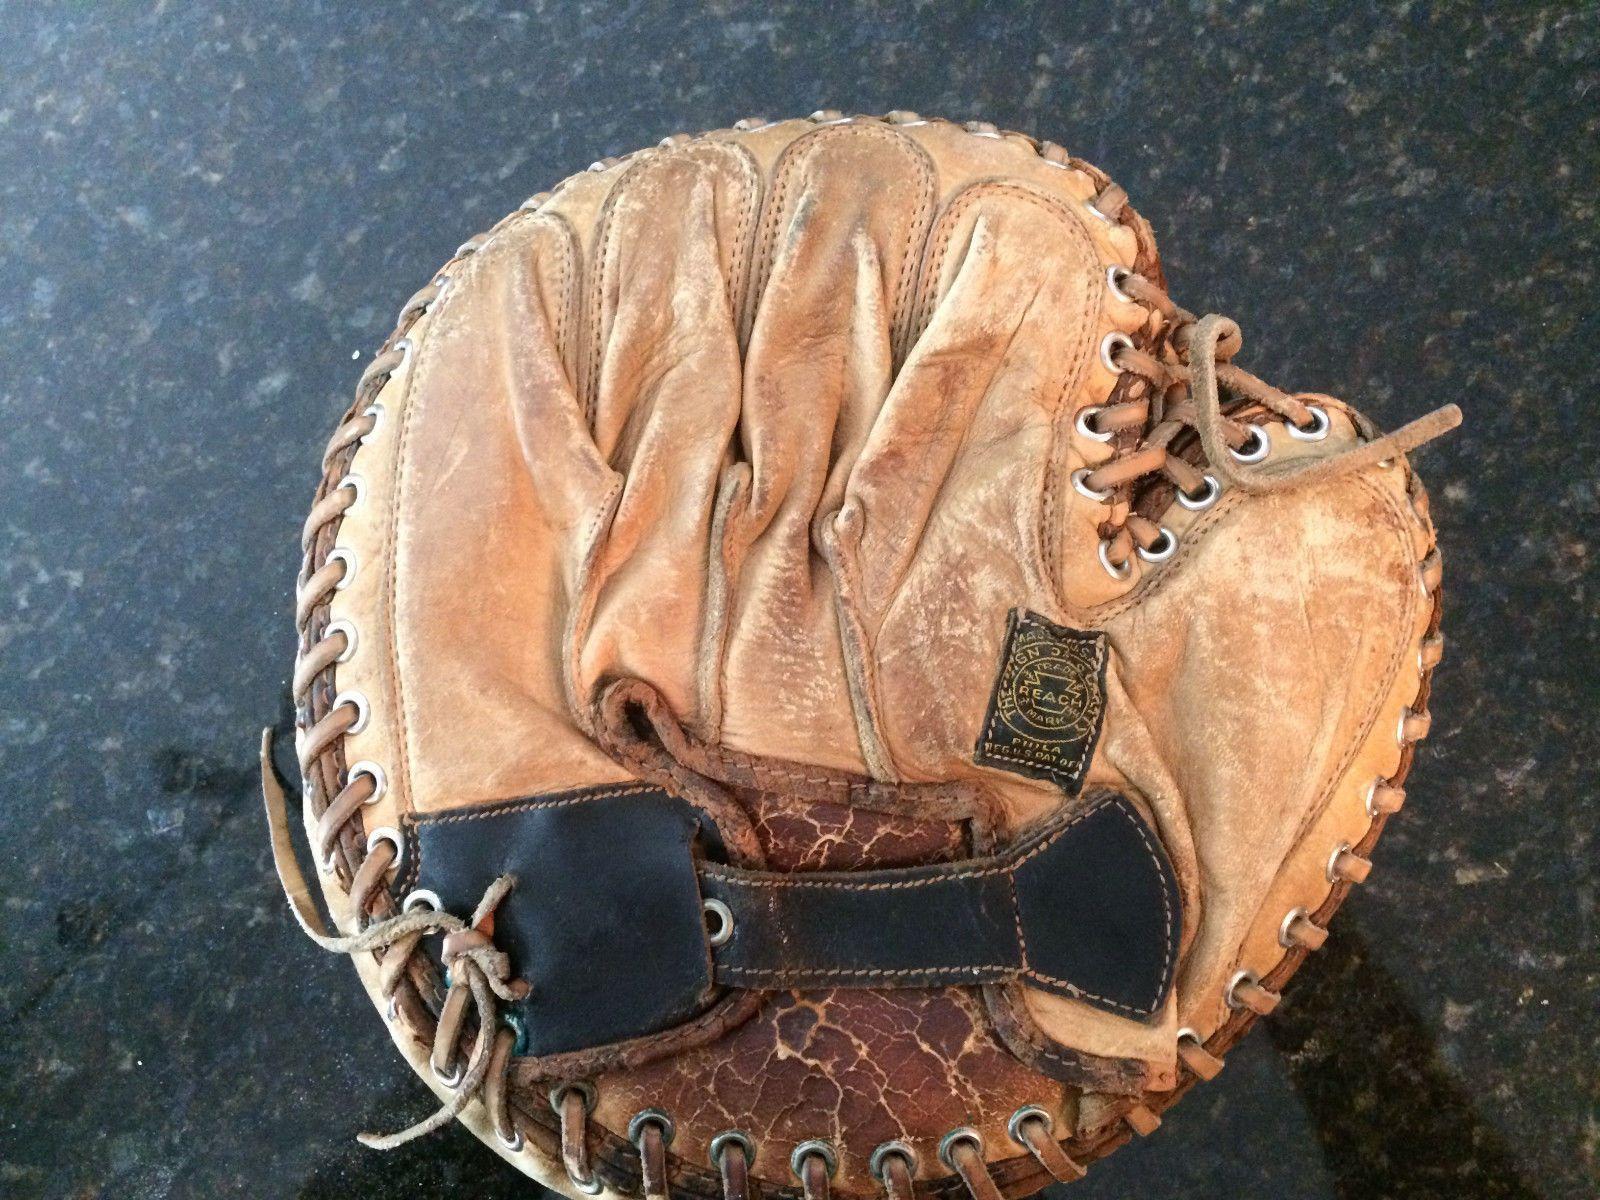 1890/'s The Catcher mask Antique baseball photograph Catchers glove